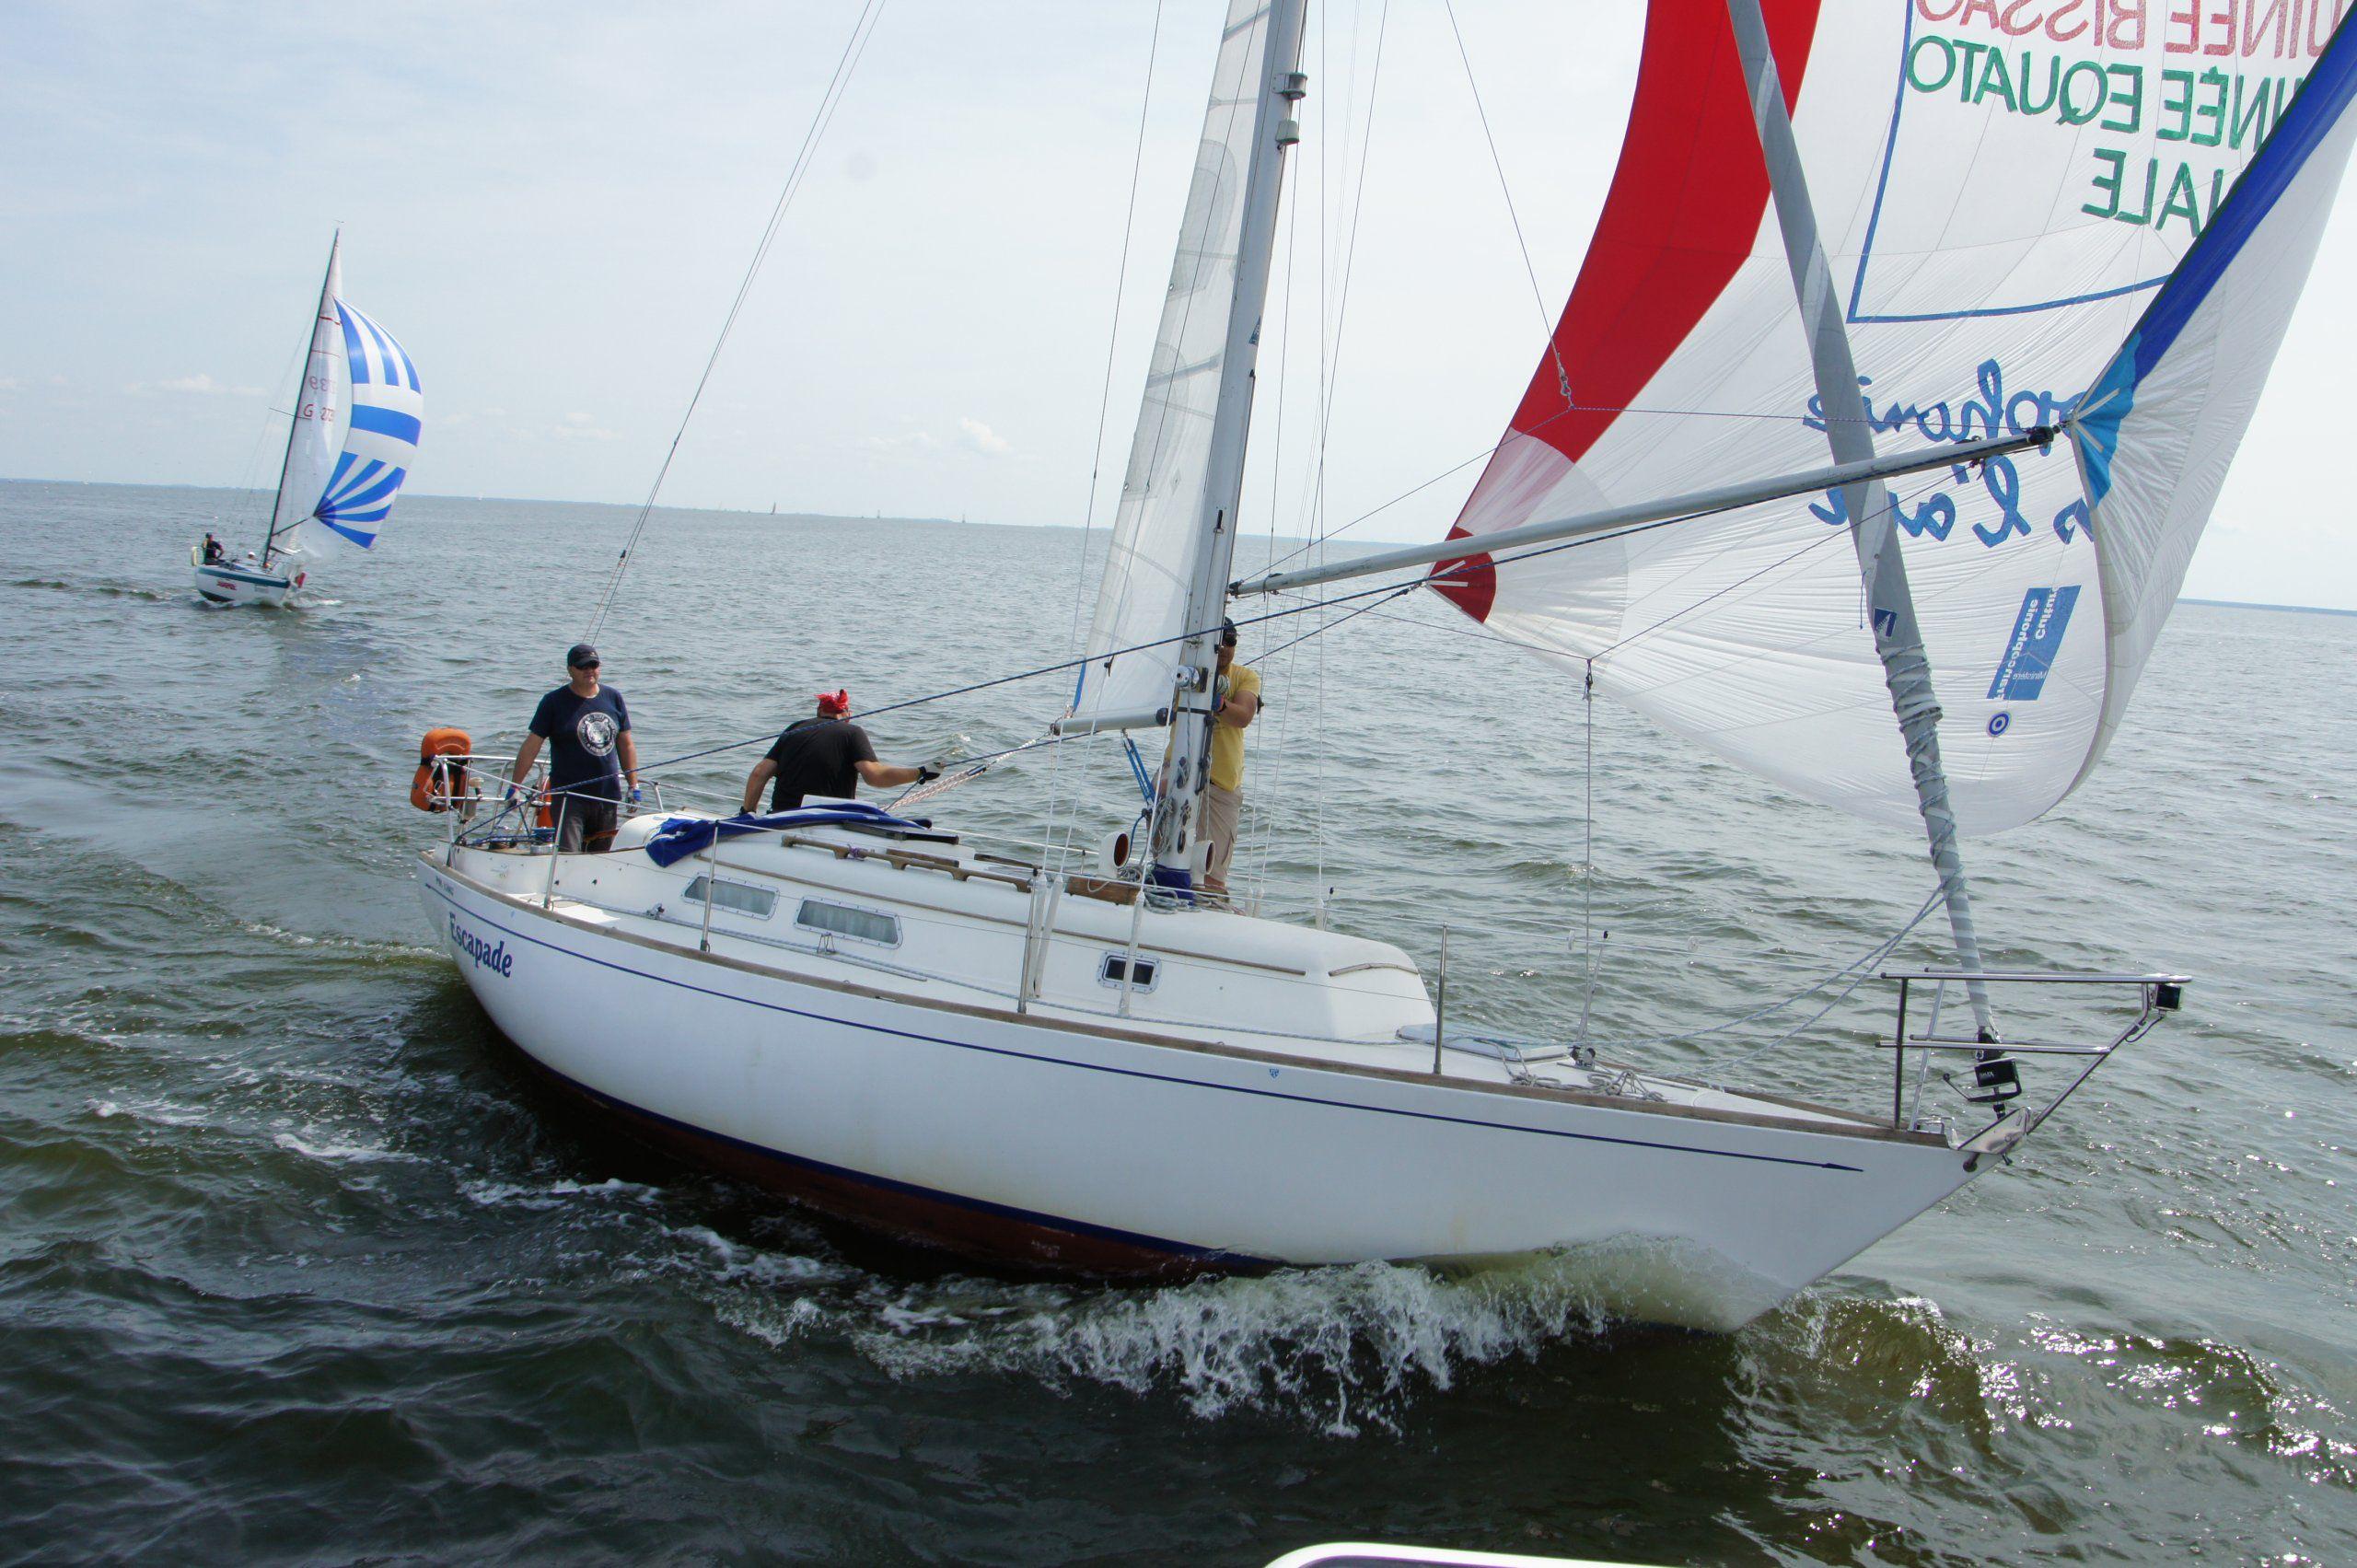 Прогулка на парусной яхте с обучением и практикой фото 3